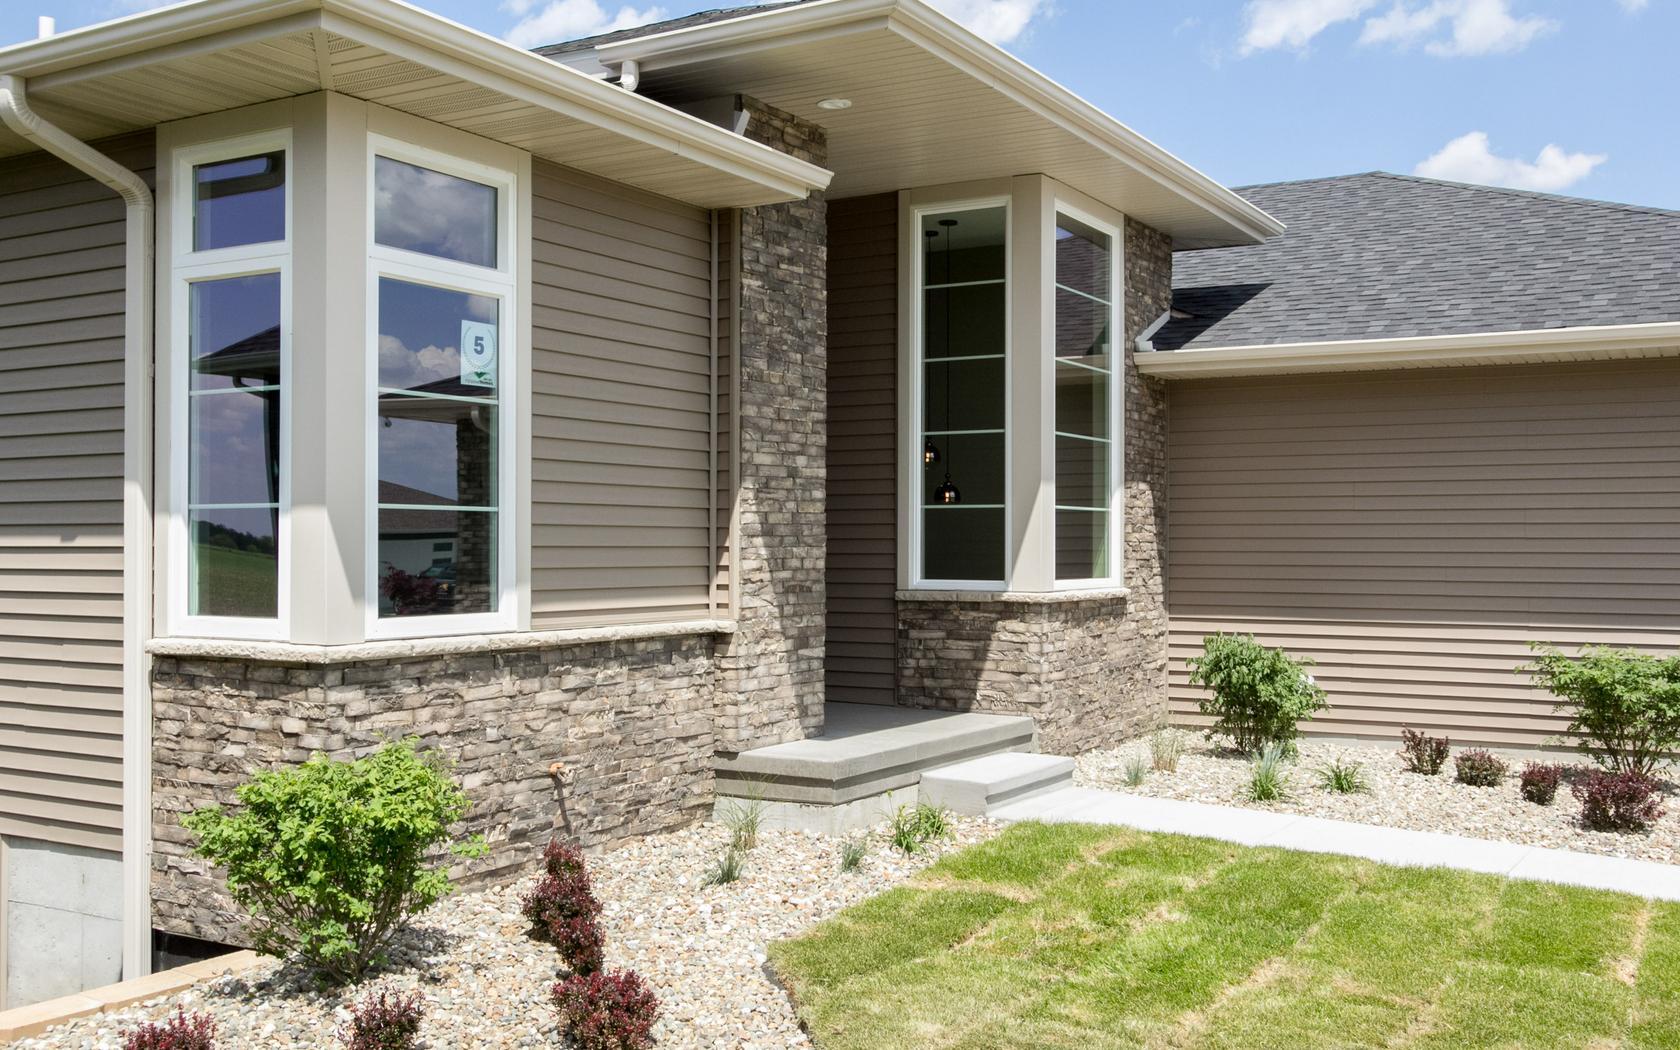 H&H Home Builders Exterior Design Image #39